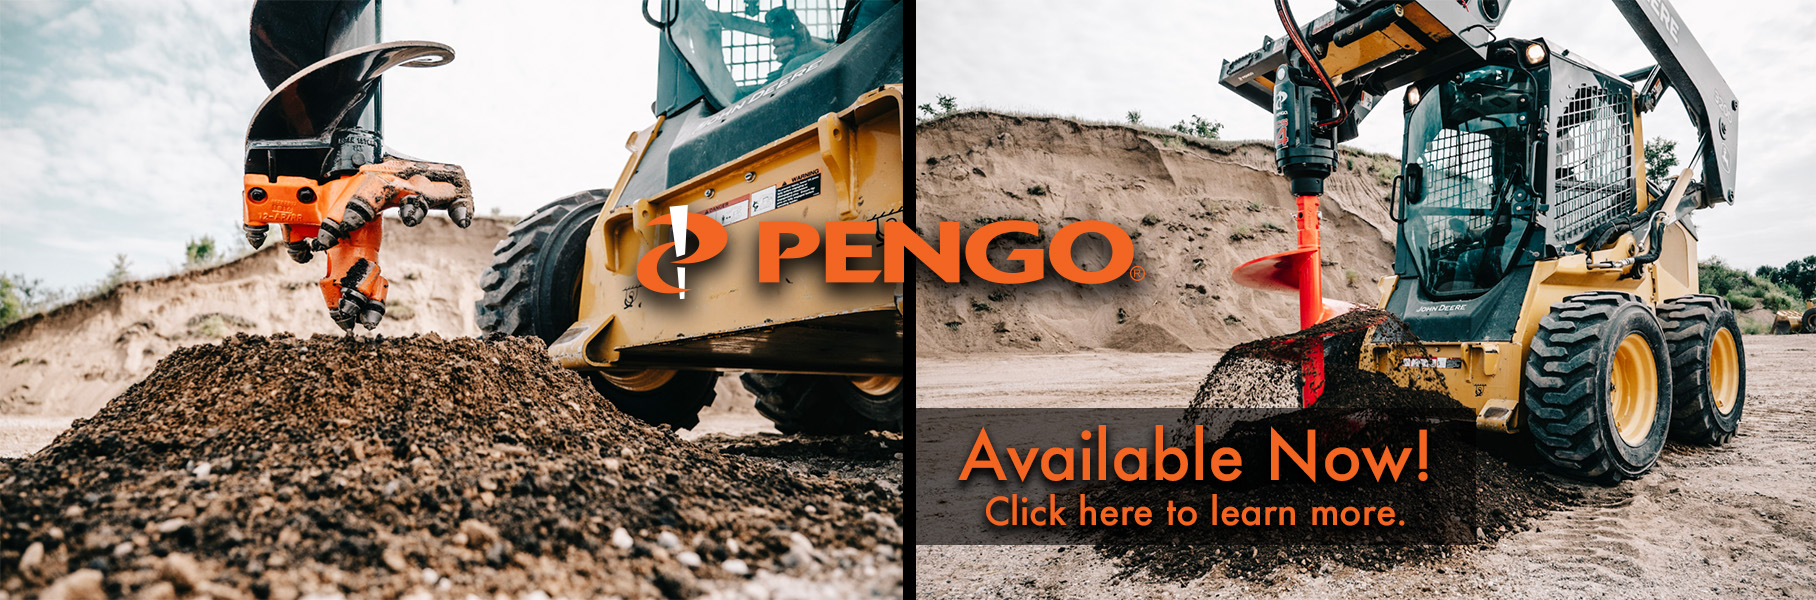 pengo-attachments-banner.jpg